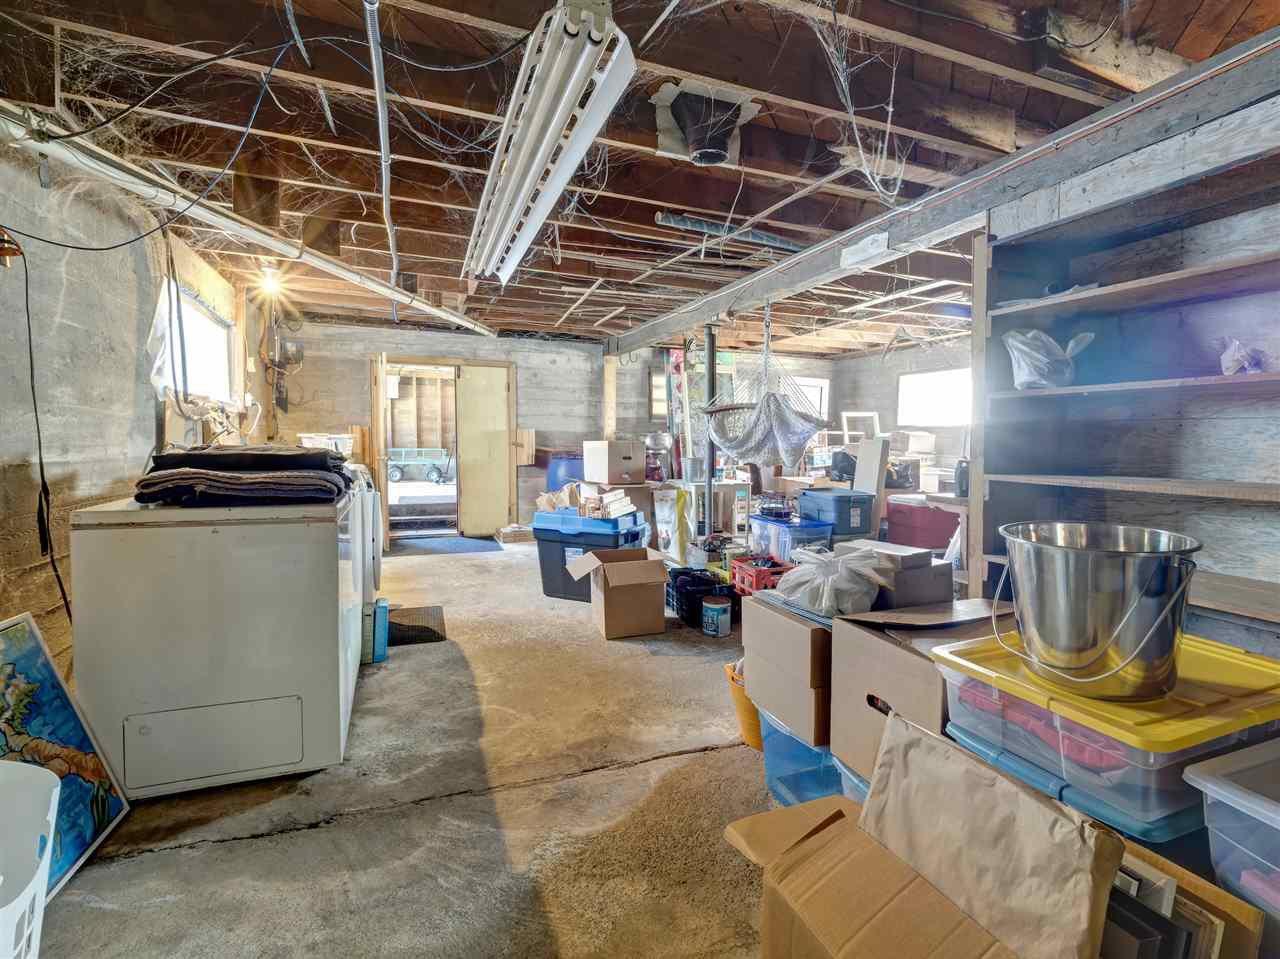 Photo 23: Photos: 5761 MCLAUGHAN Road in Sechelt: Sechelt District House for sale (Sunshine Coast)  : MLS®# R2479077